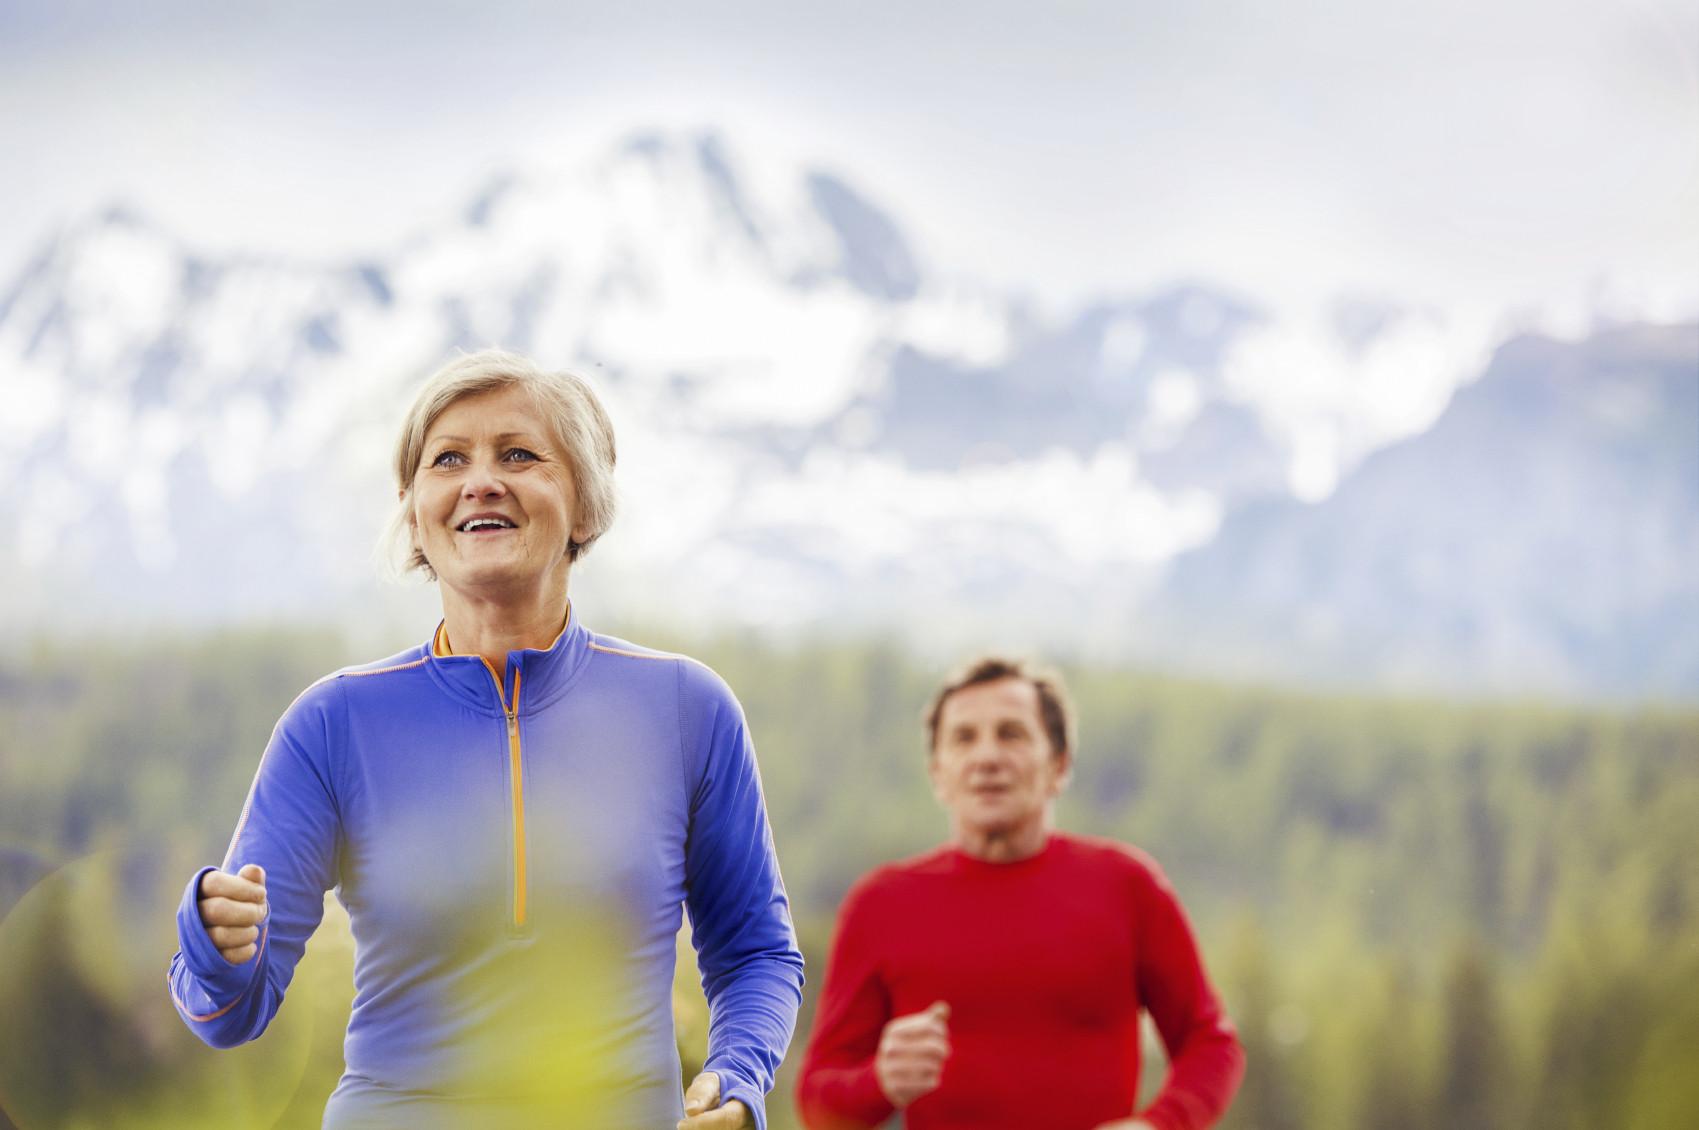 seniors-exercising-jogging